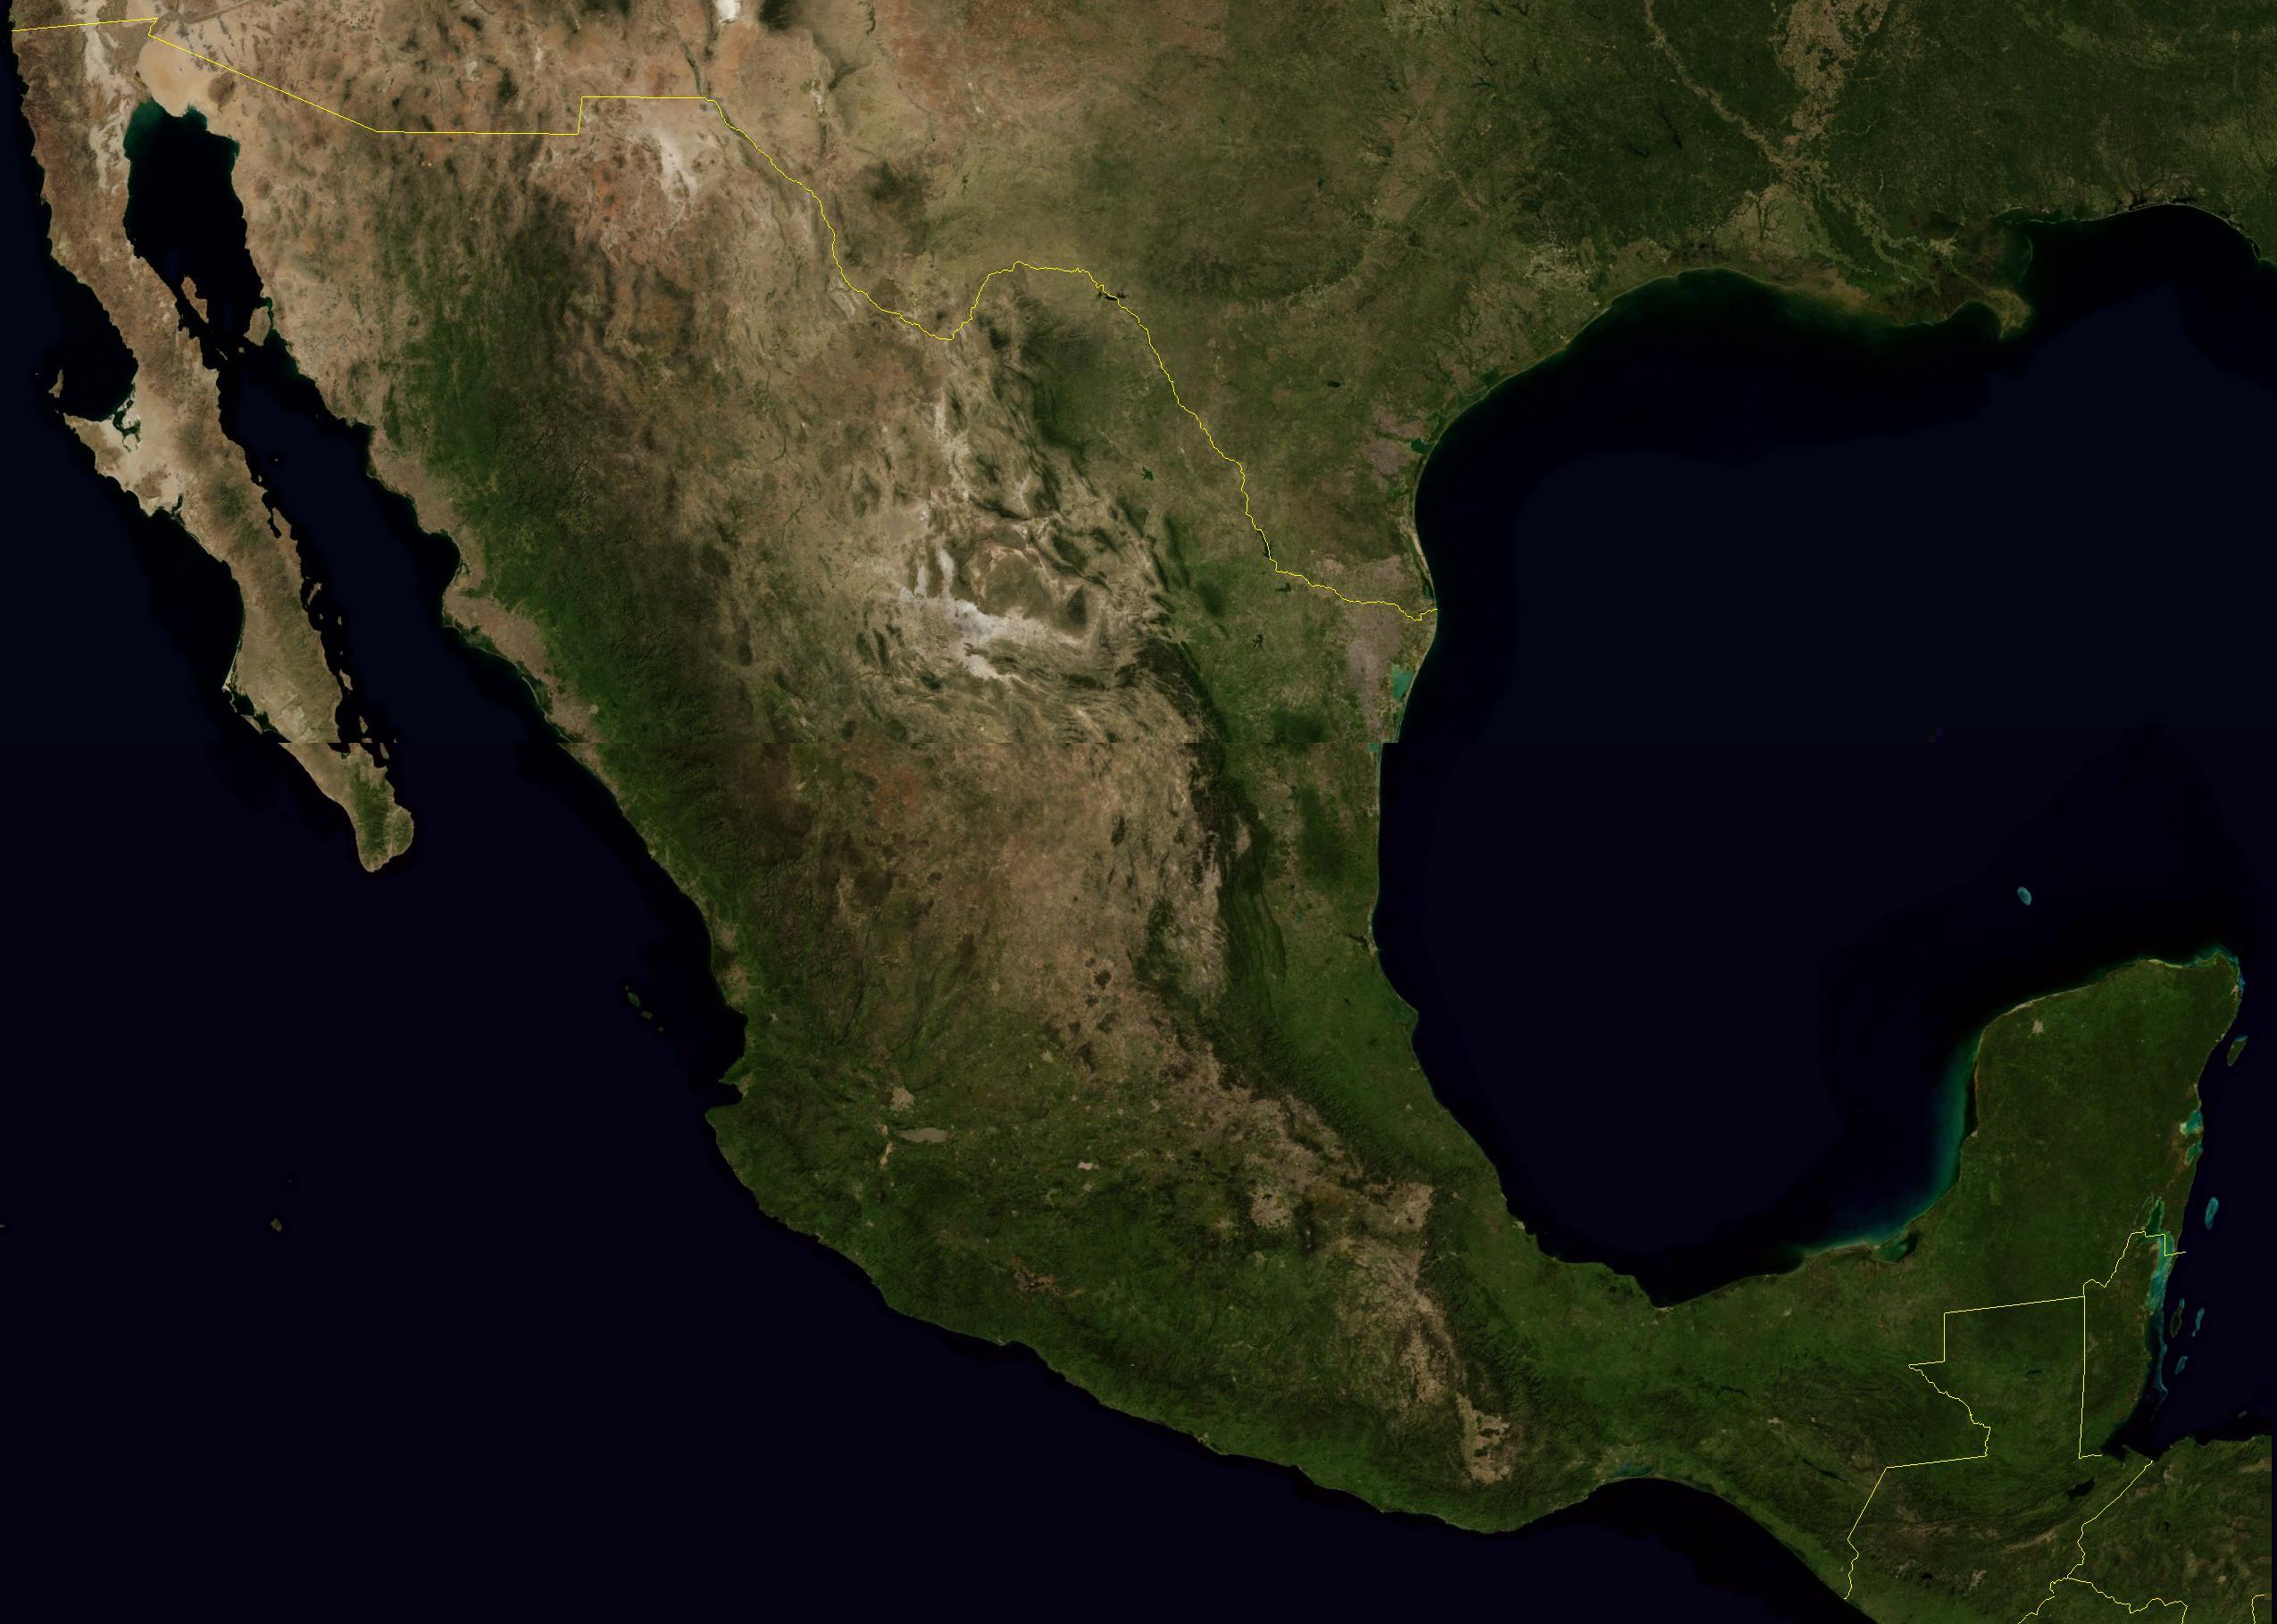 ver imegenes ciudad mexico via satelite: